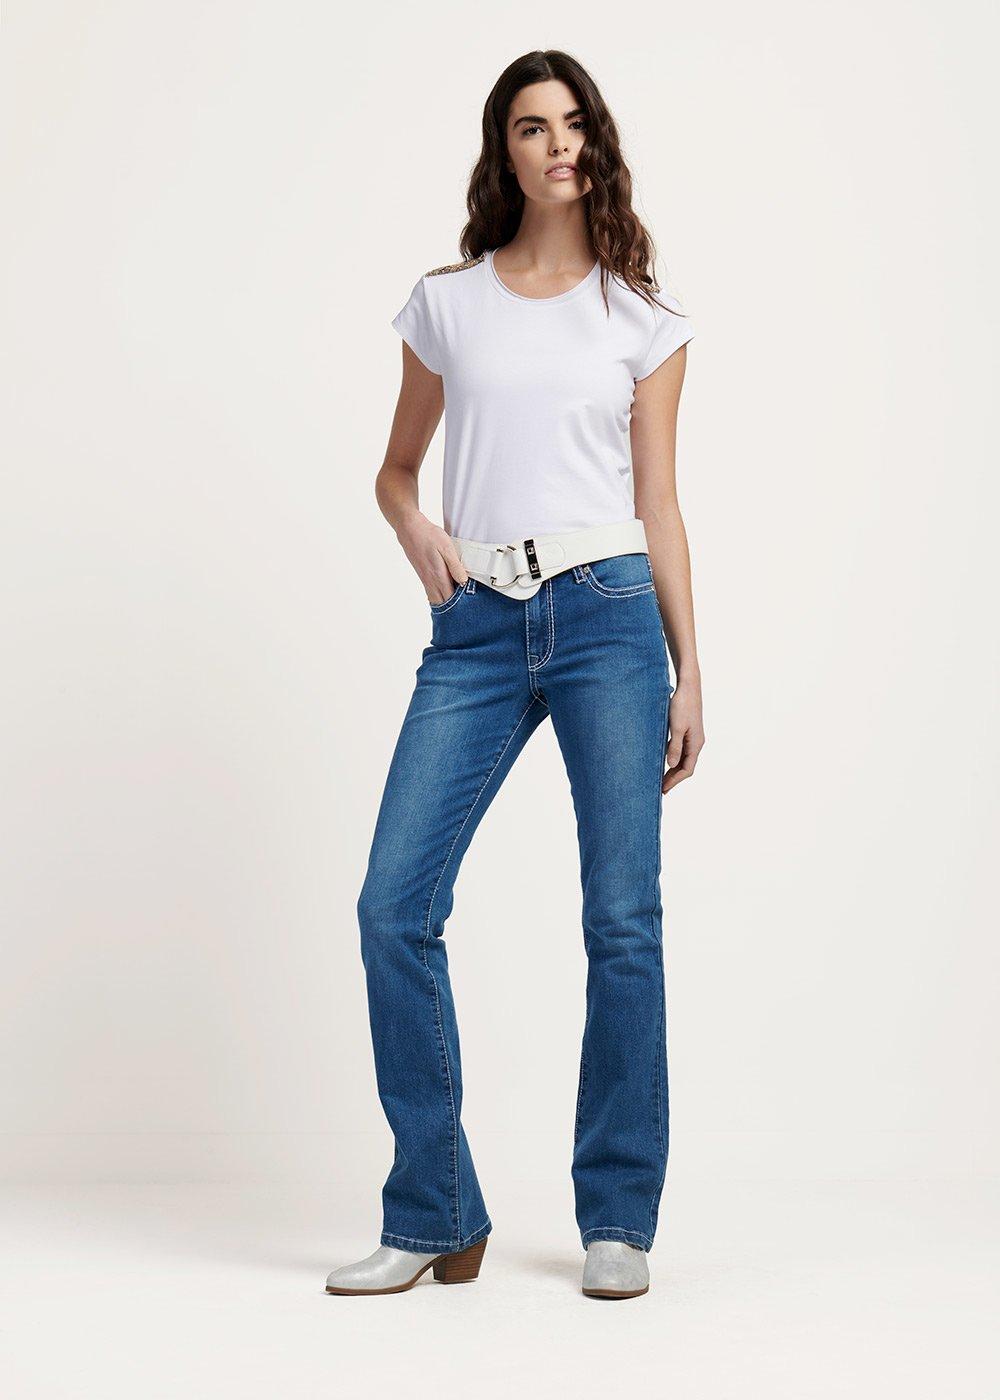 Pantalone denim Daryl cinque tasche - Medium Denim - Donna